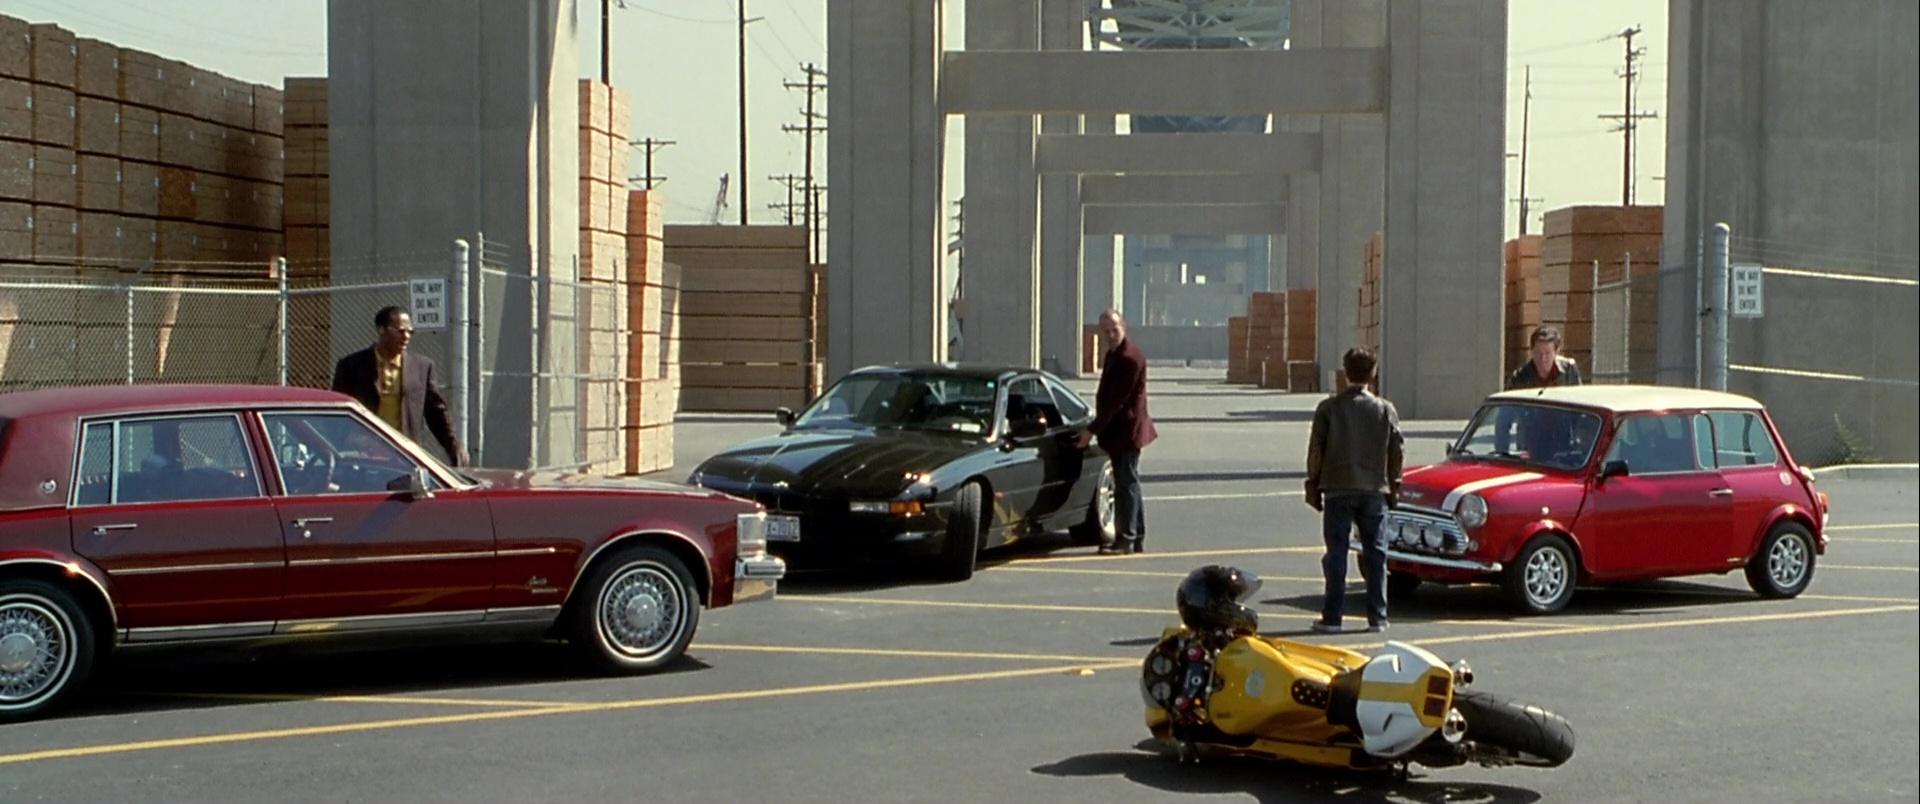 List Of Car Brands >> BMW 840Ci [E31] Car Used by Jason Statham in The Italian ...